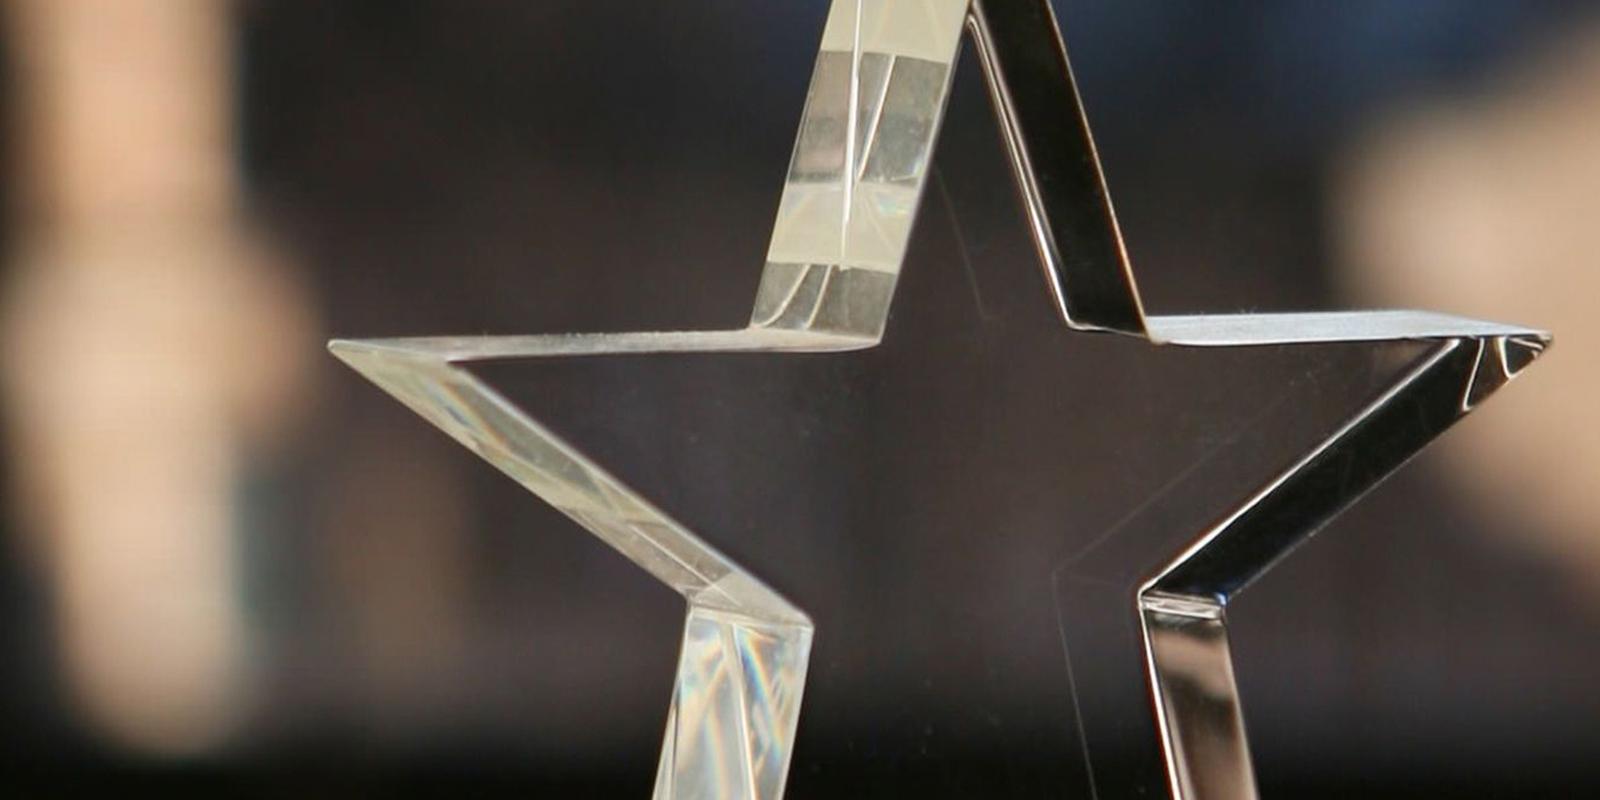 Nectar Desk Wins Financesonline 2016 Customer Experiences